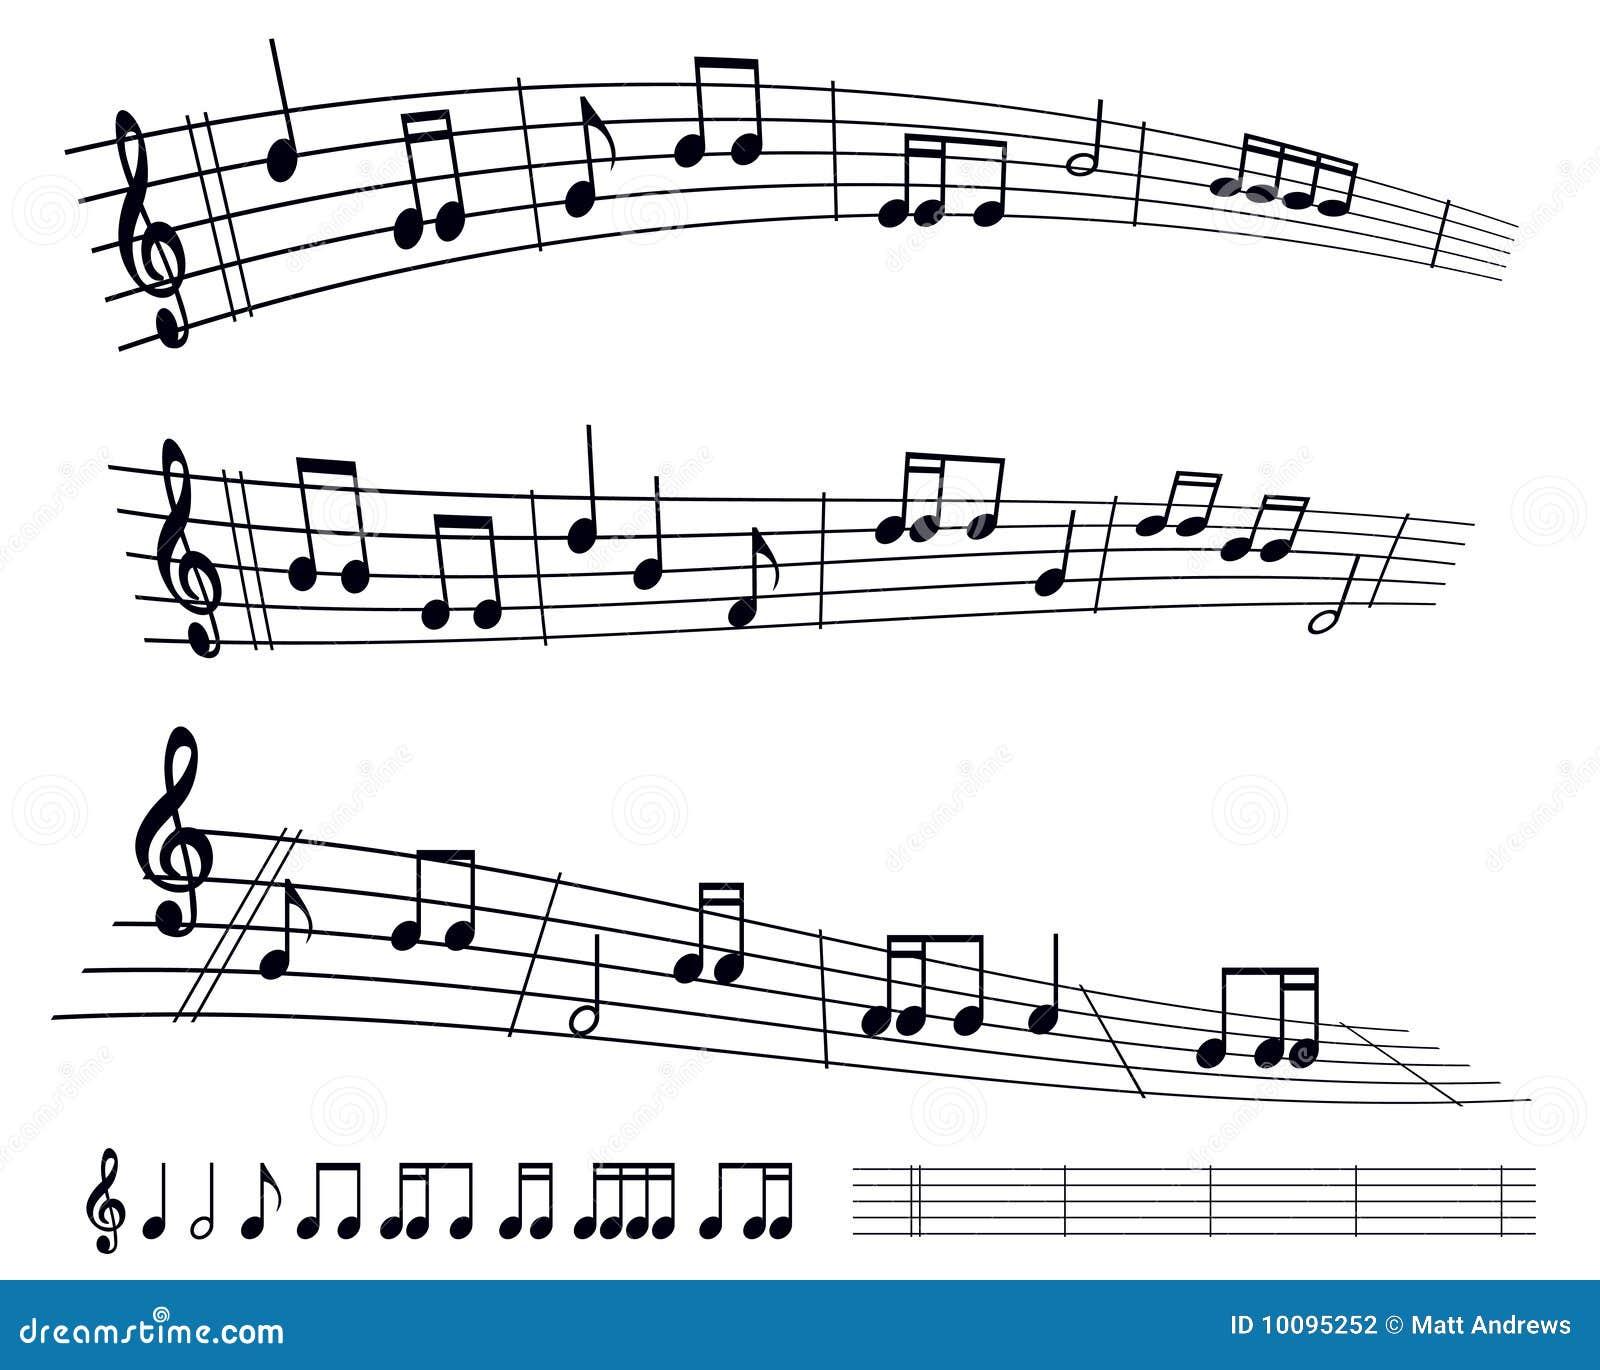 Sheet Music Stock Vector. Illustration Of Crotchet, Line